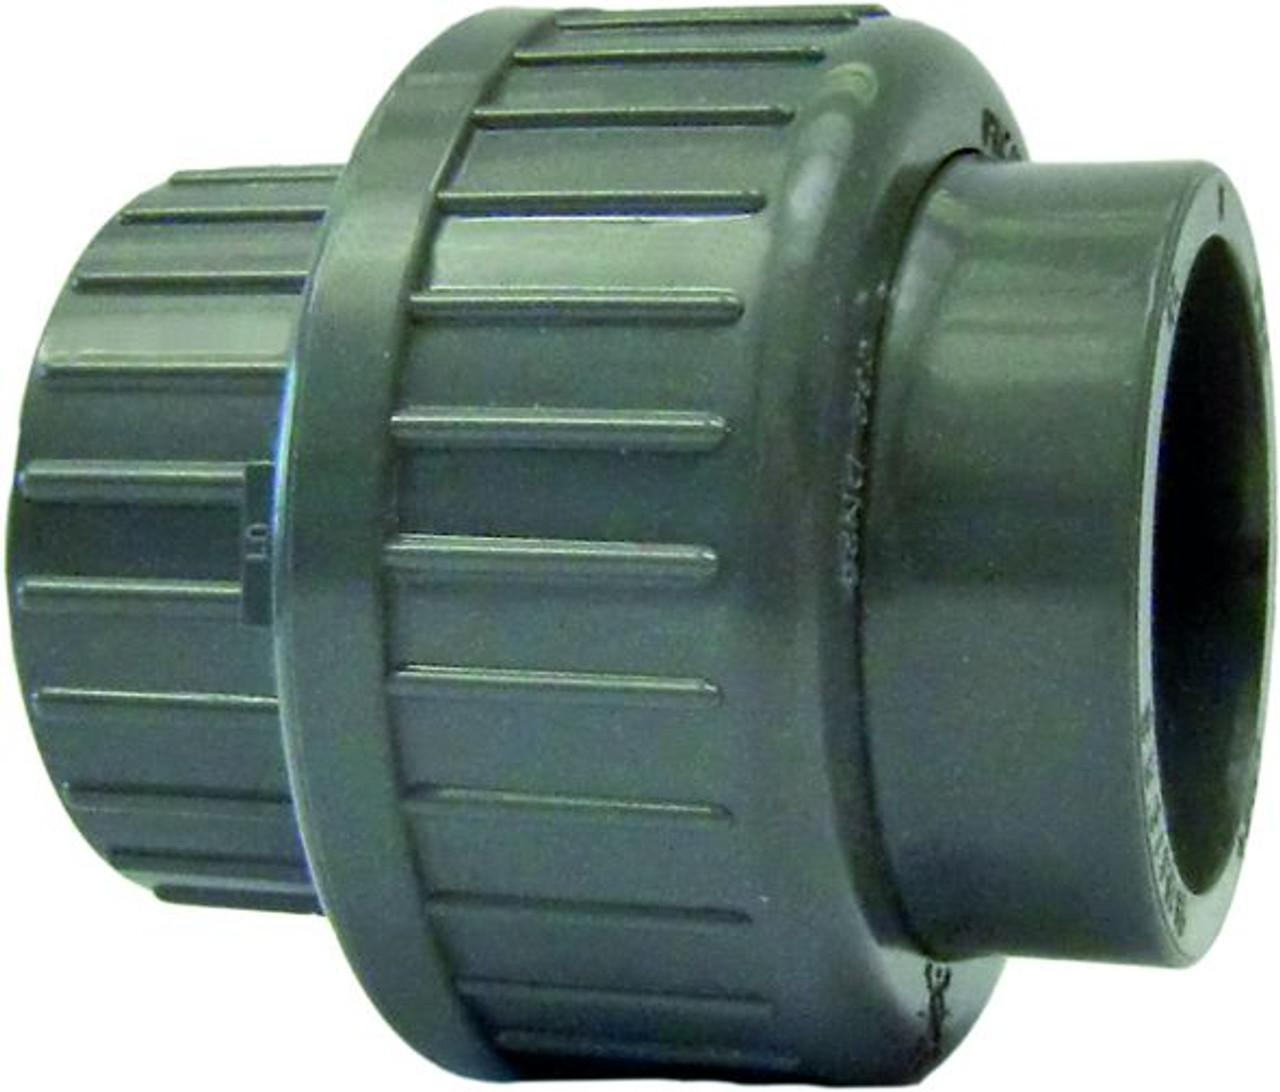 +GF+ | Union SxS PVC-U/EPDM  25DN20 (721510107)